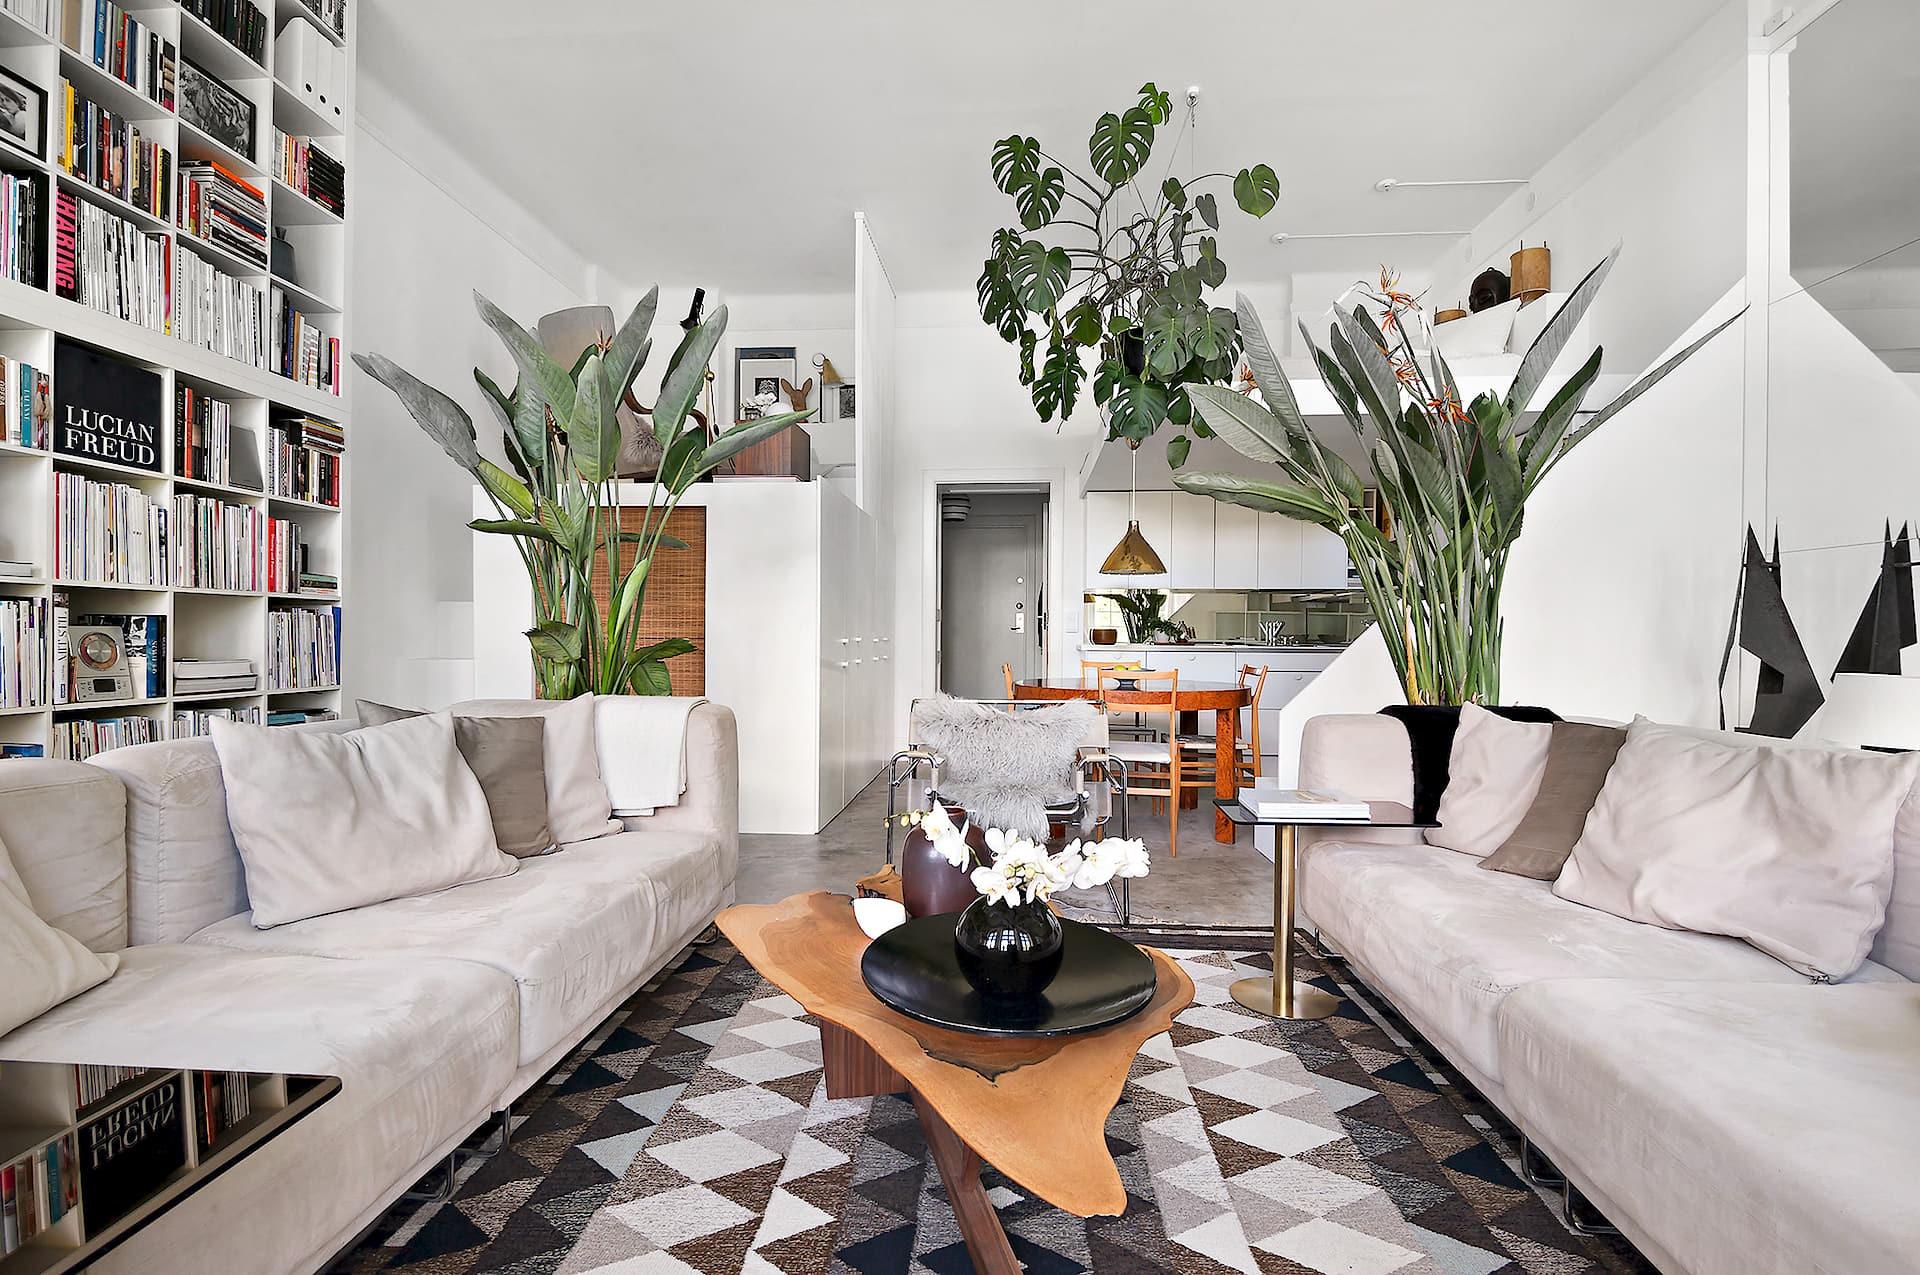 гостиная диваны комнатные цветы